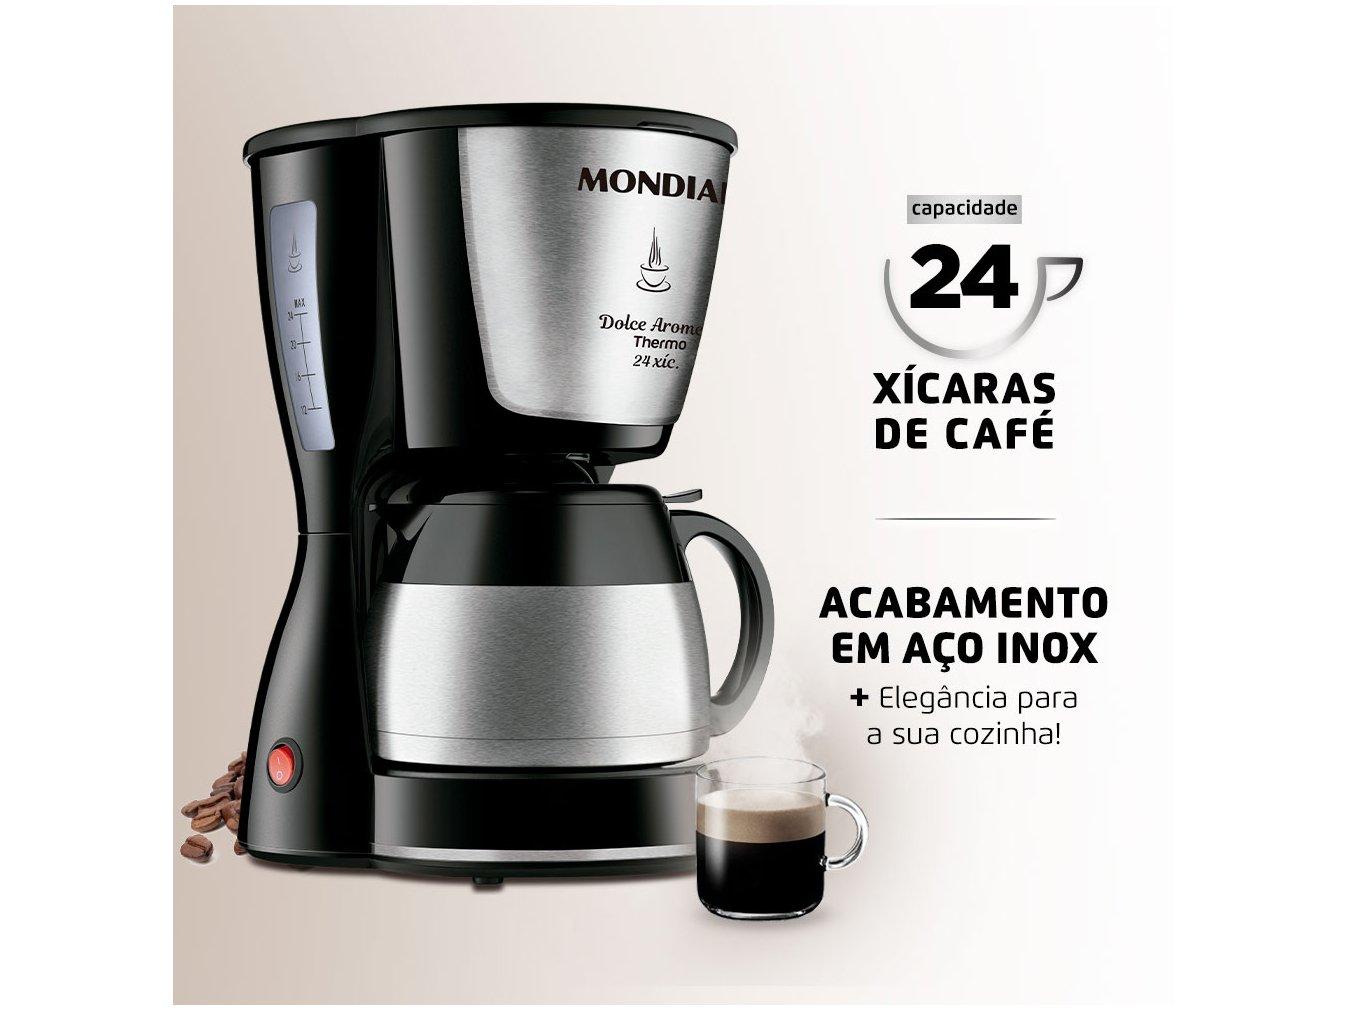 Cafeteira Elétrica Mondial Dolce Arome Thermo Inox C-33 JT 24 Xícaras - Preto - 220V - 2